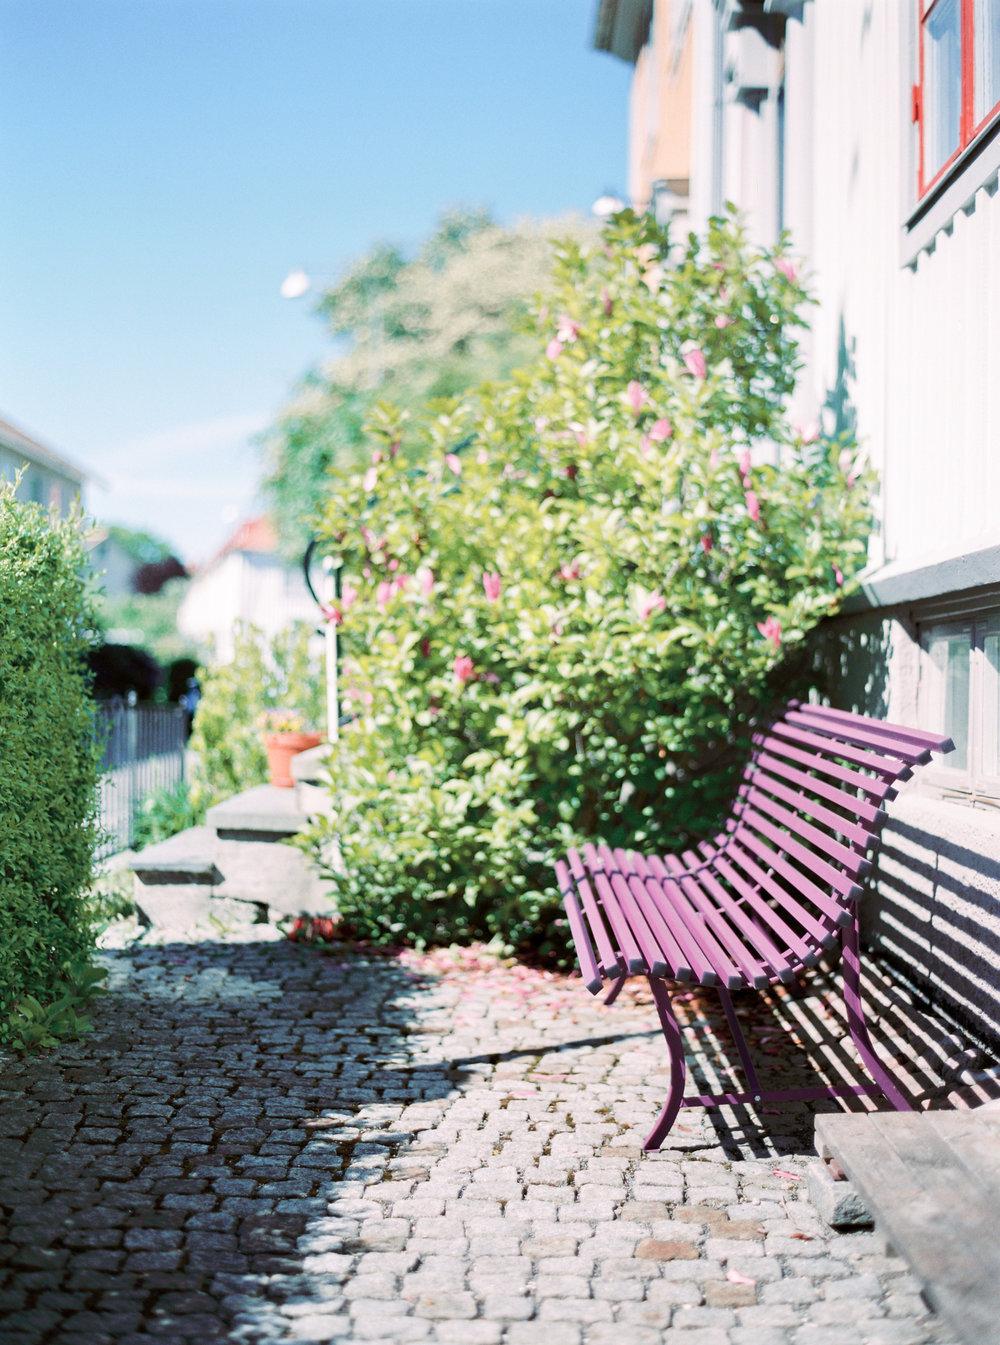 Copywrite Niklas Andersson. niklasanderssonphoto@gmail.com